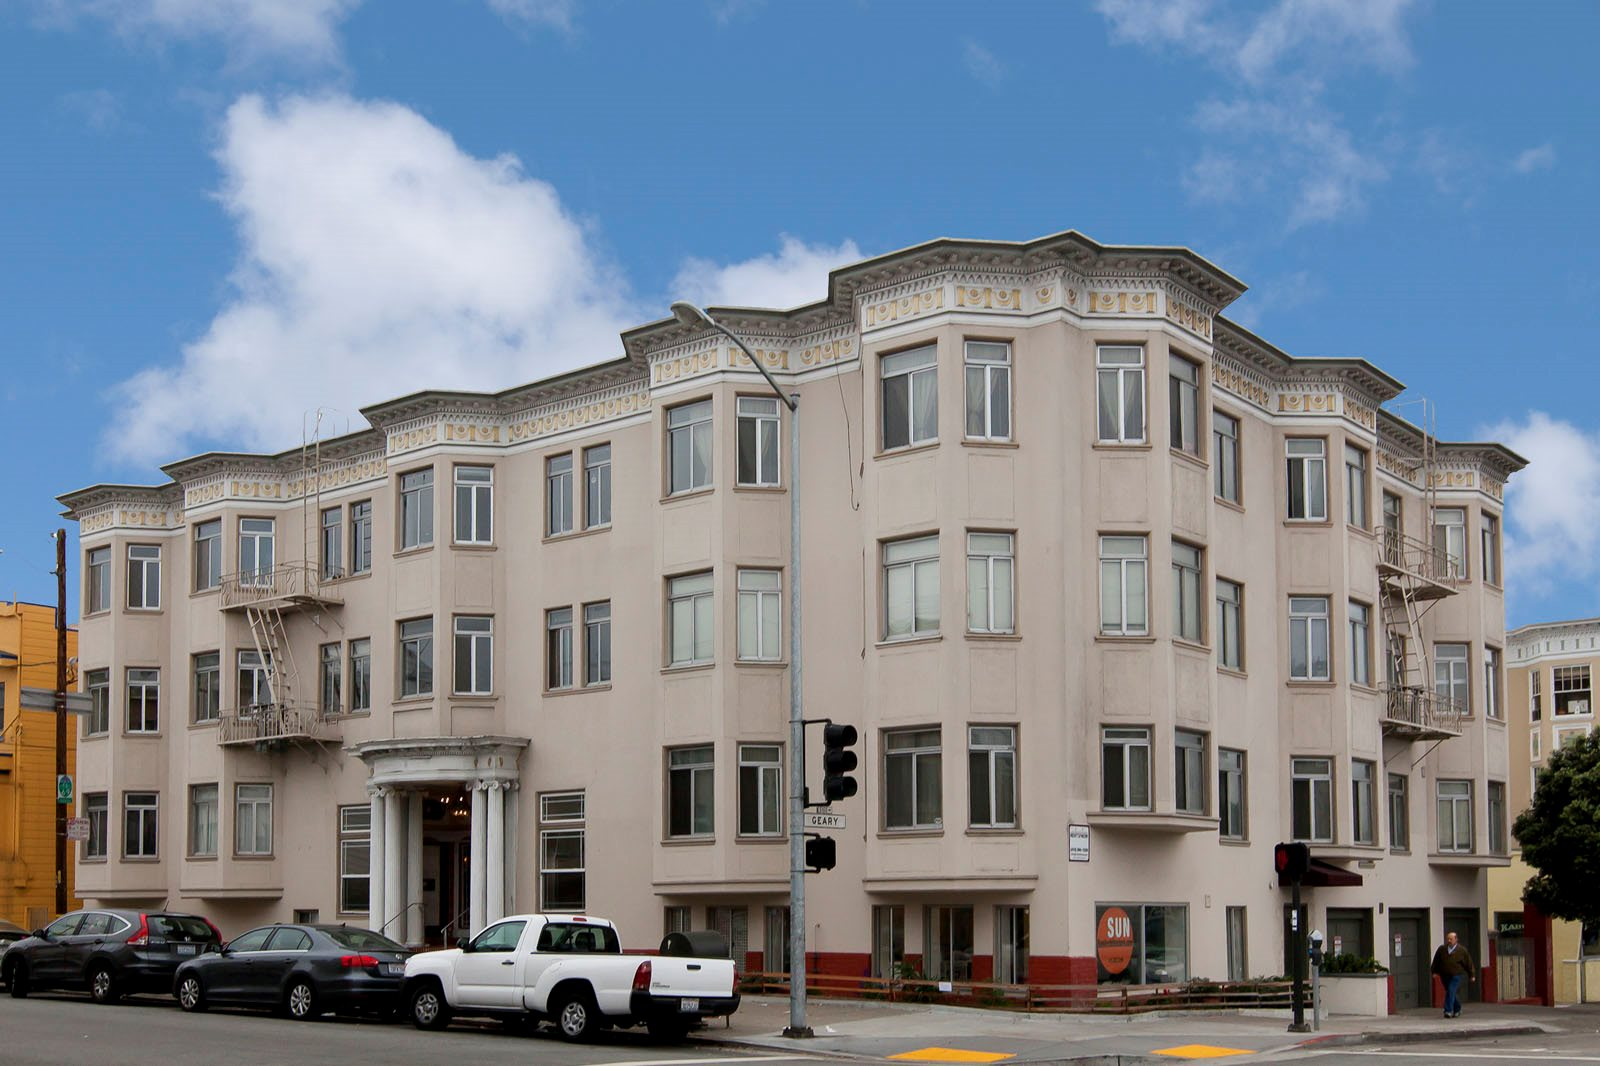 15th St, San Francisco